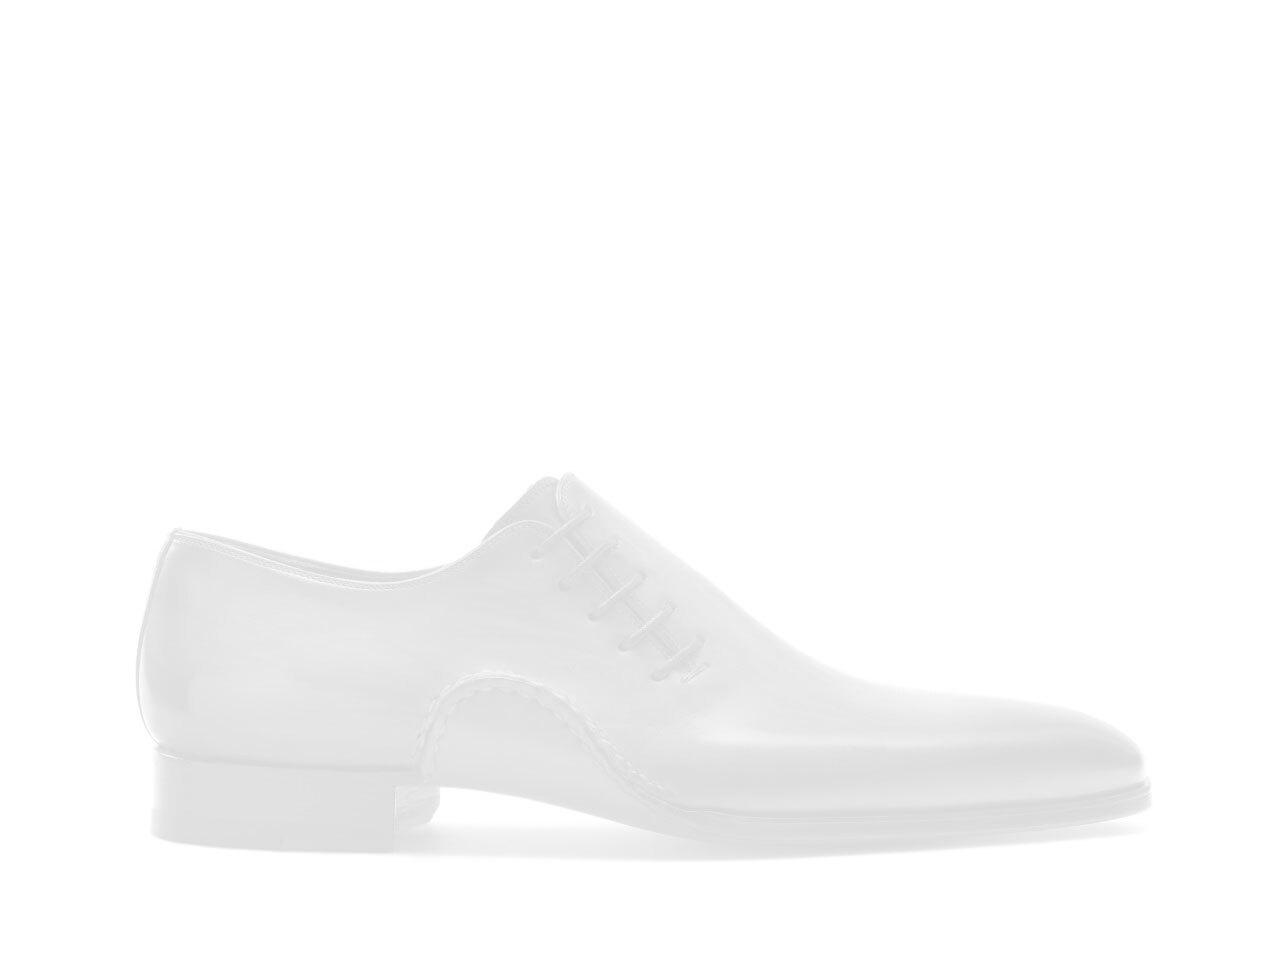 Sole of the Magnanni Sendero Tabaco Men's Designer Boots